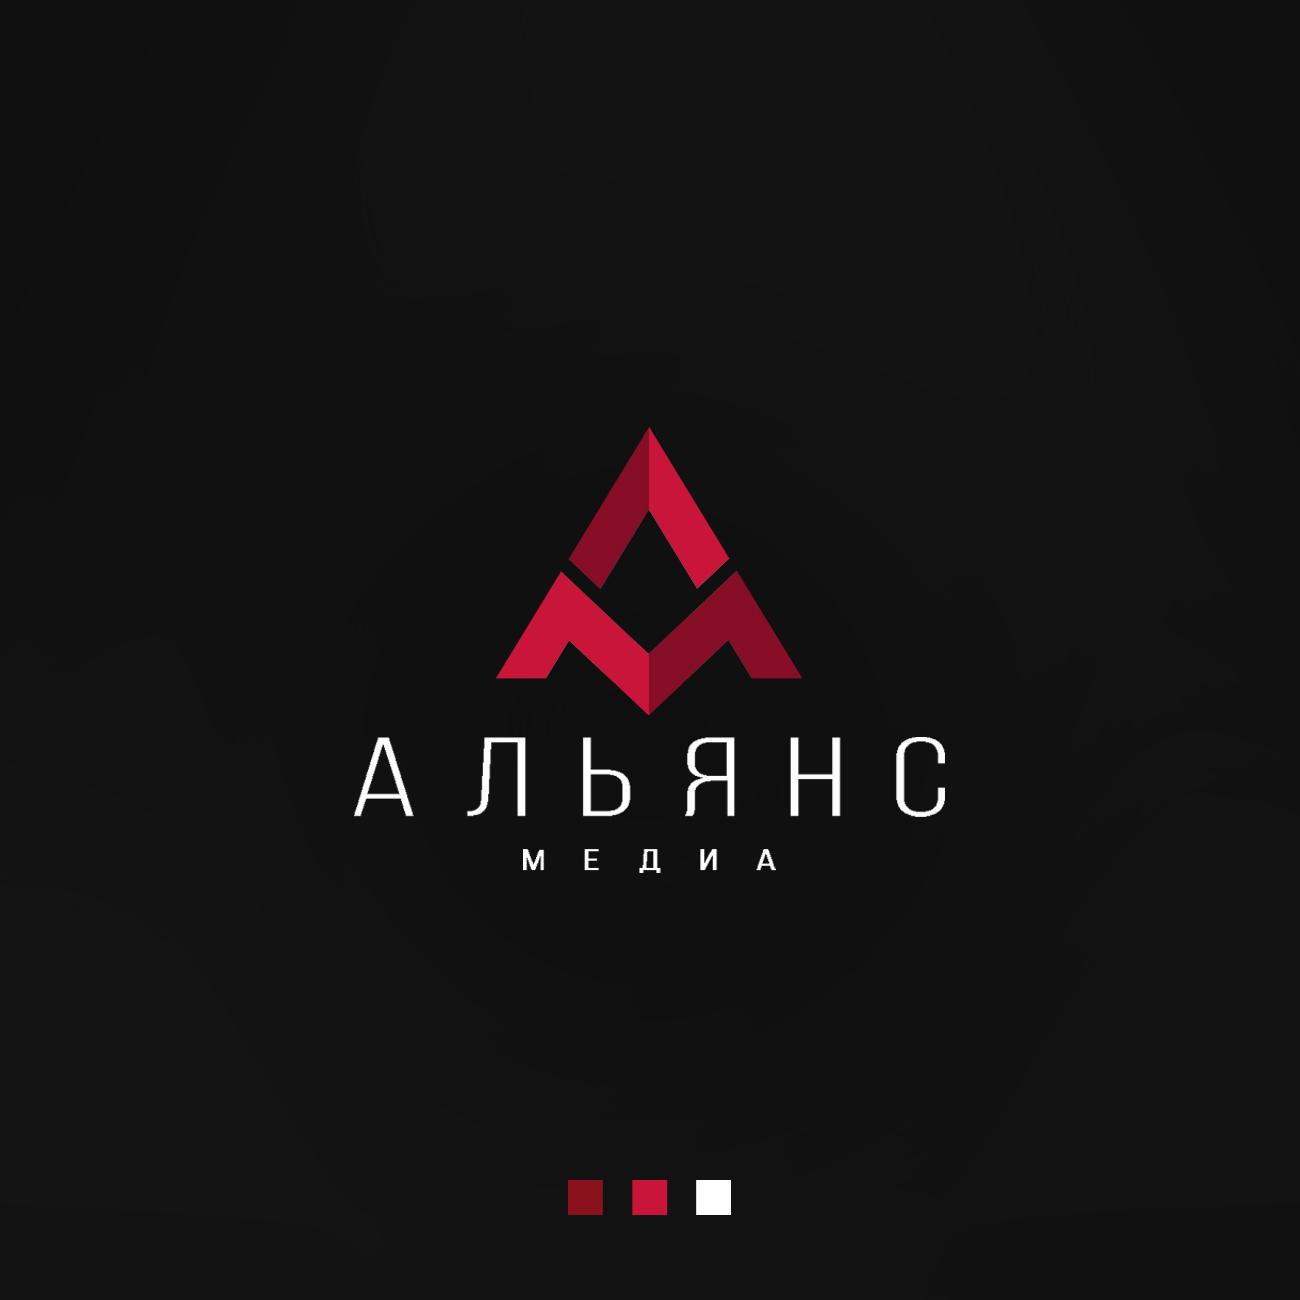 Создать логотип для компании фото f_8885ab29652d724b.jpg